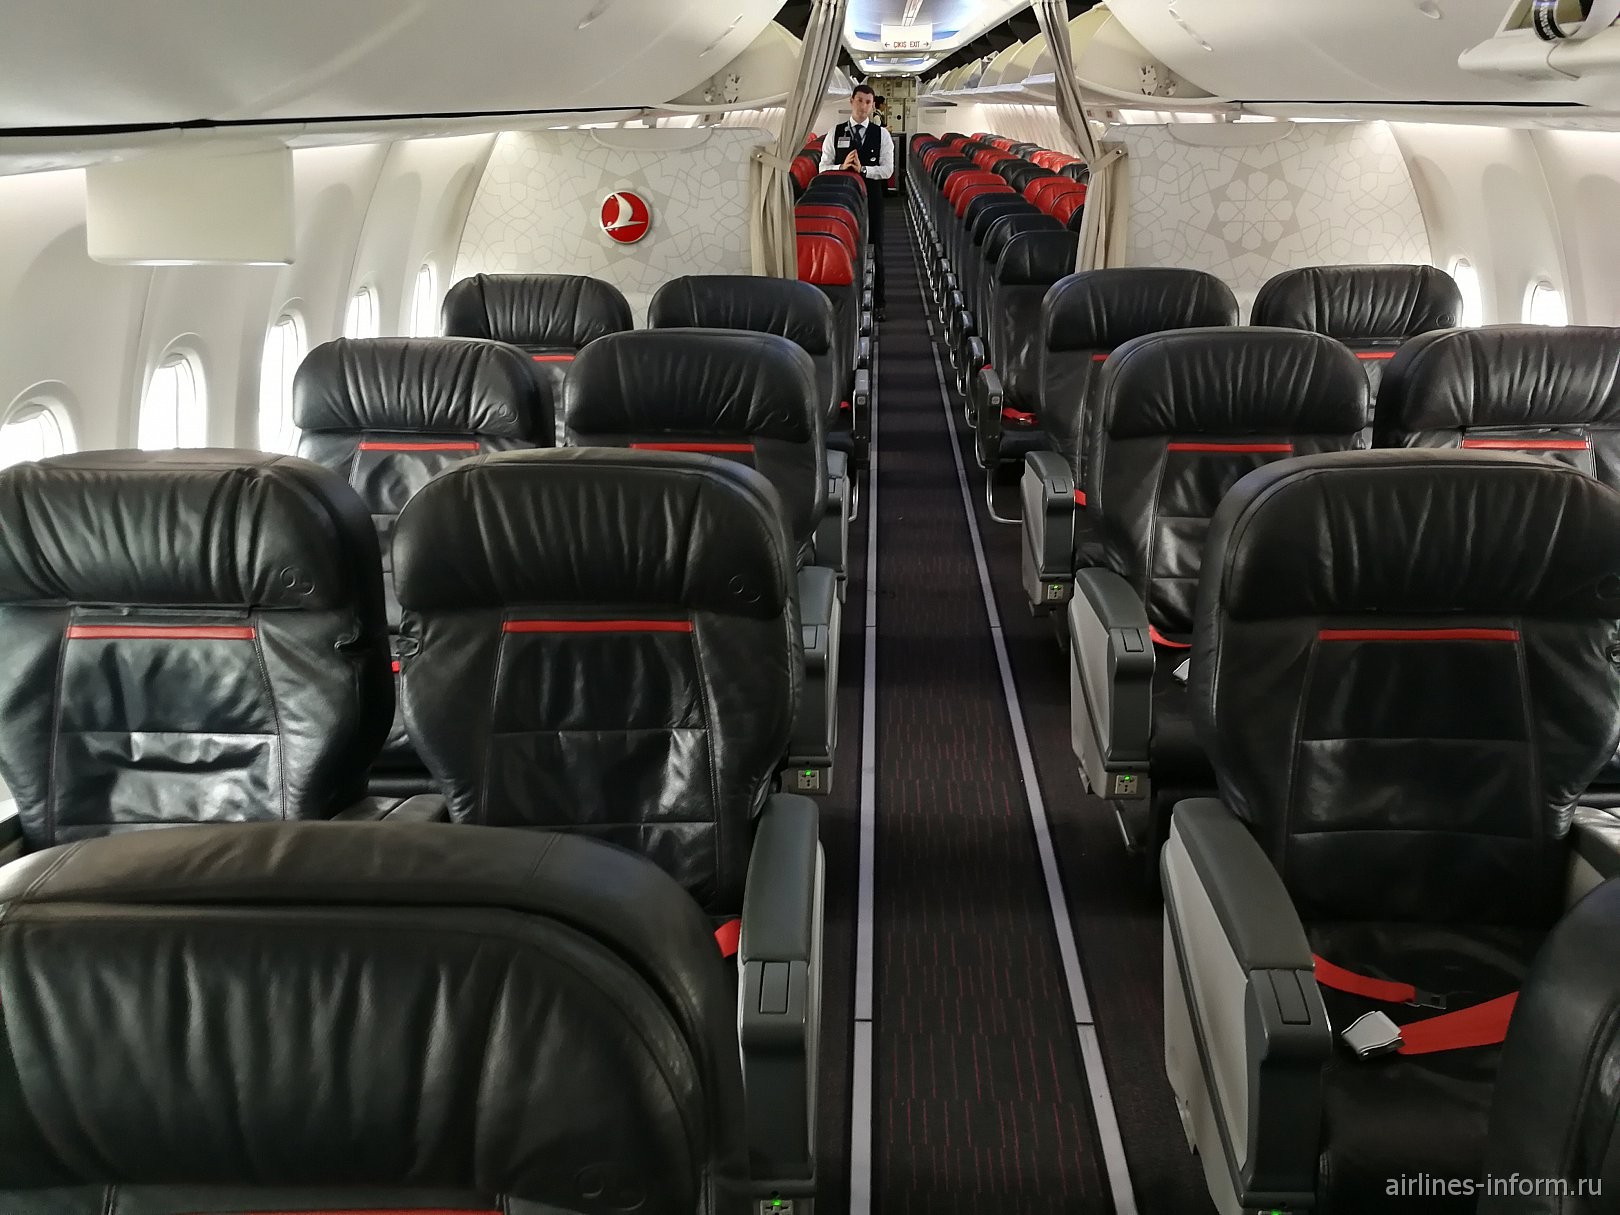 Пассажирский салон самолета Boeing 737-800 авиакомпании Turkish Airlines